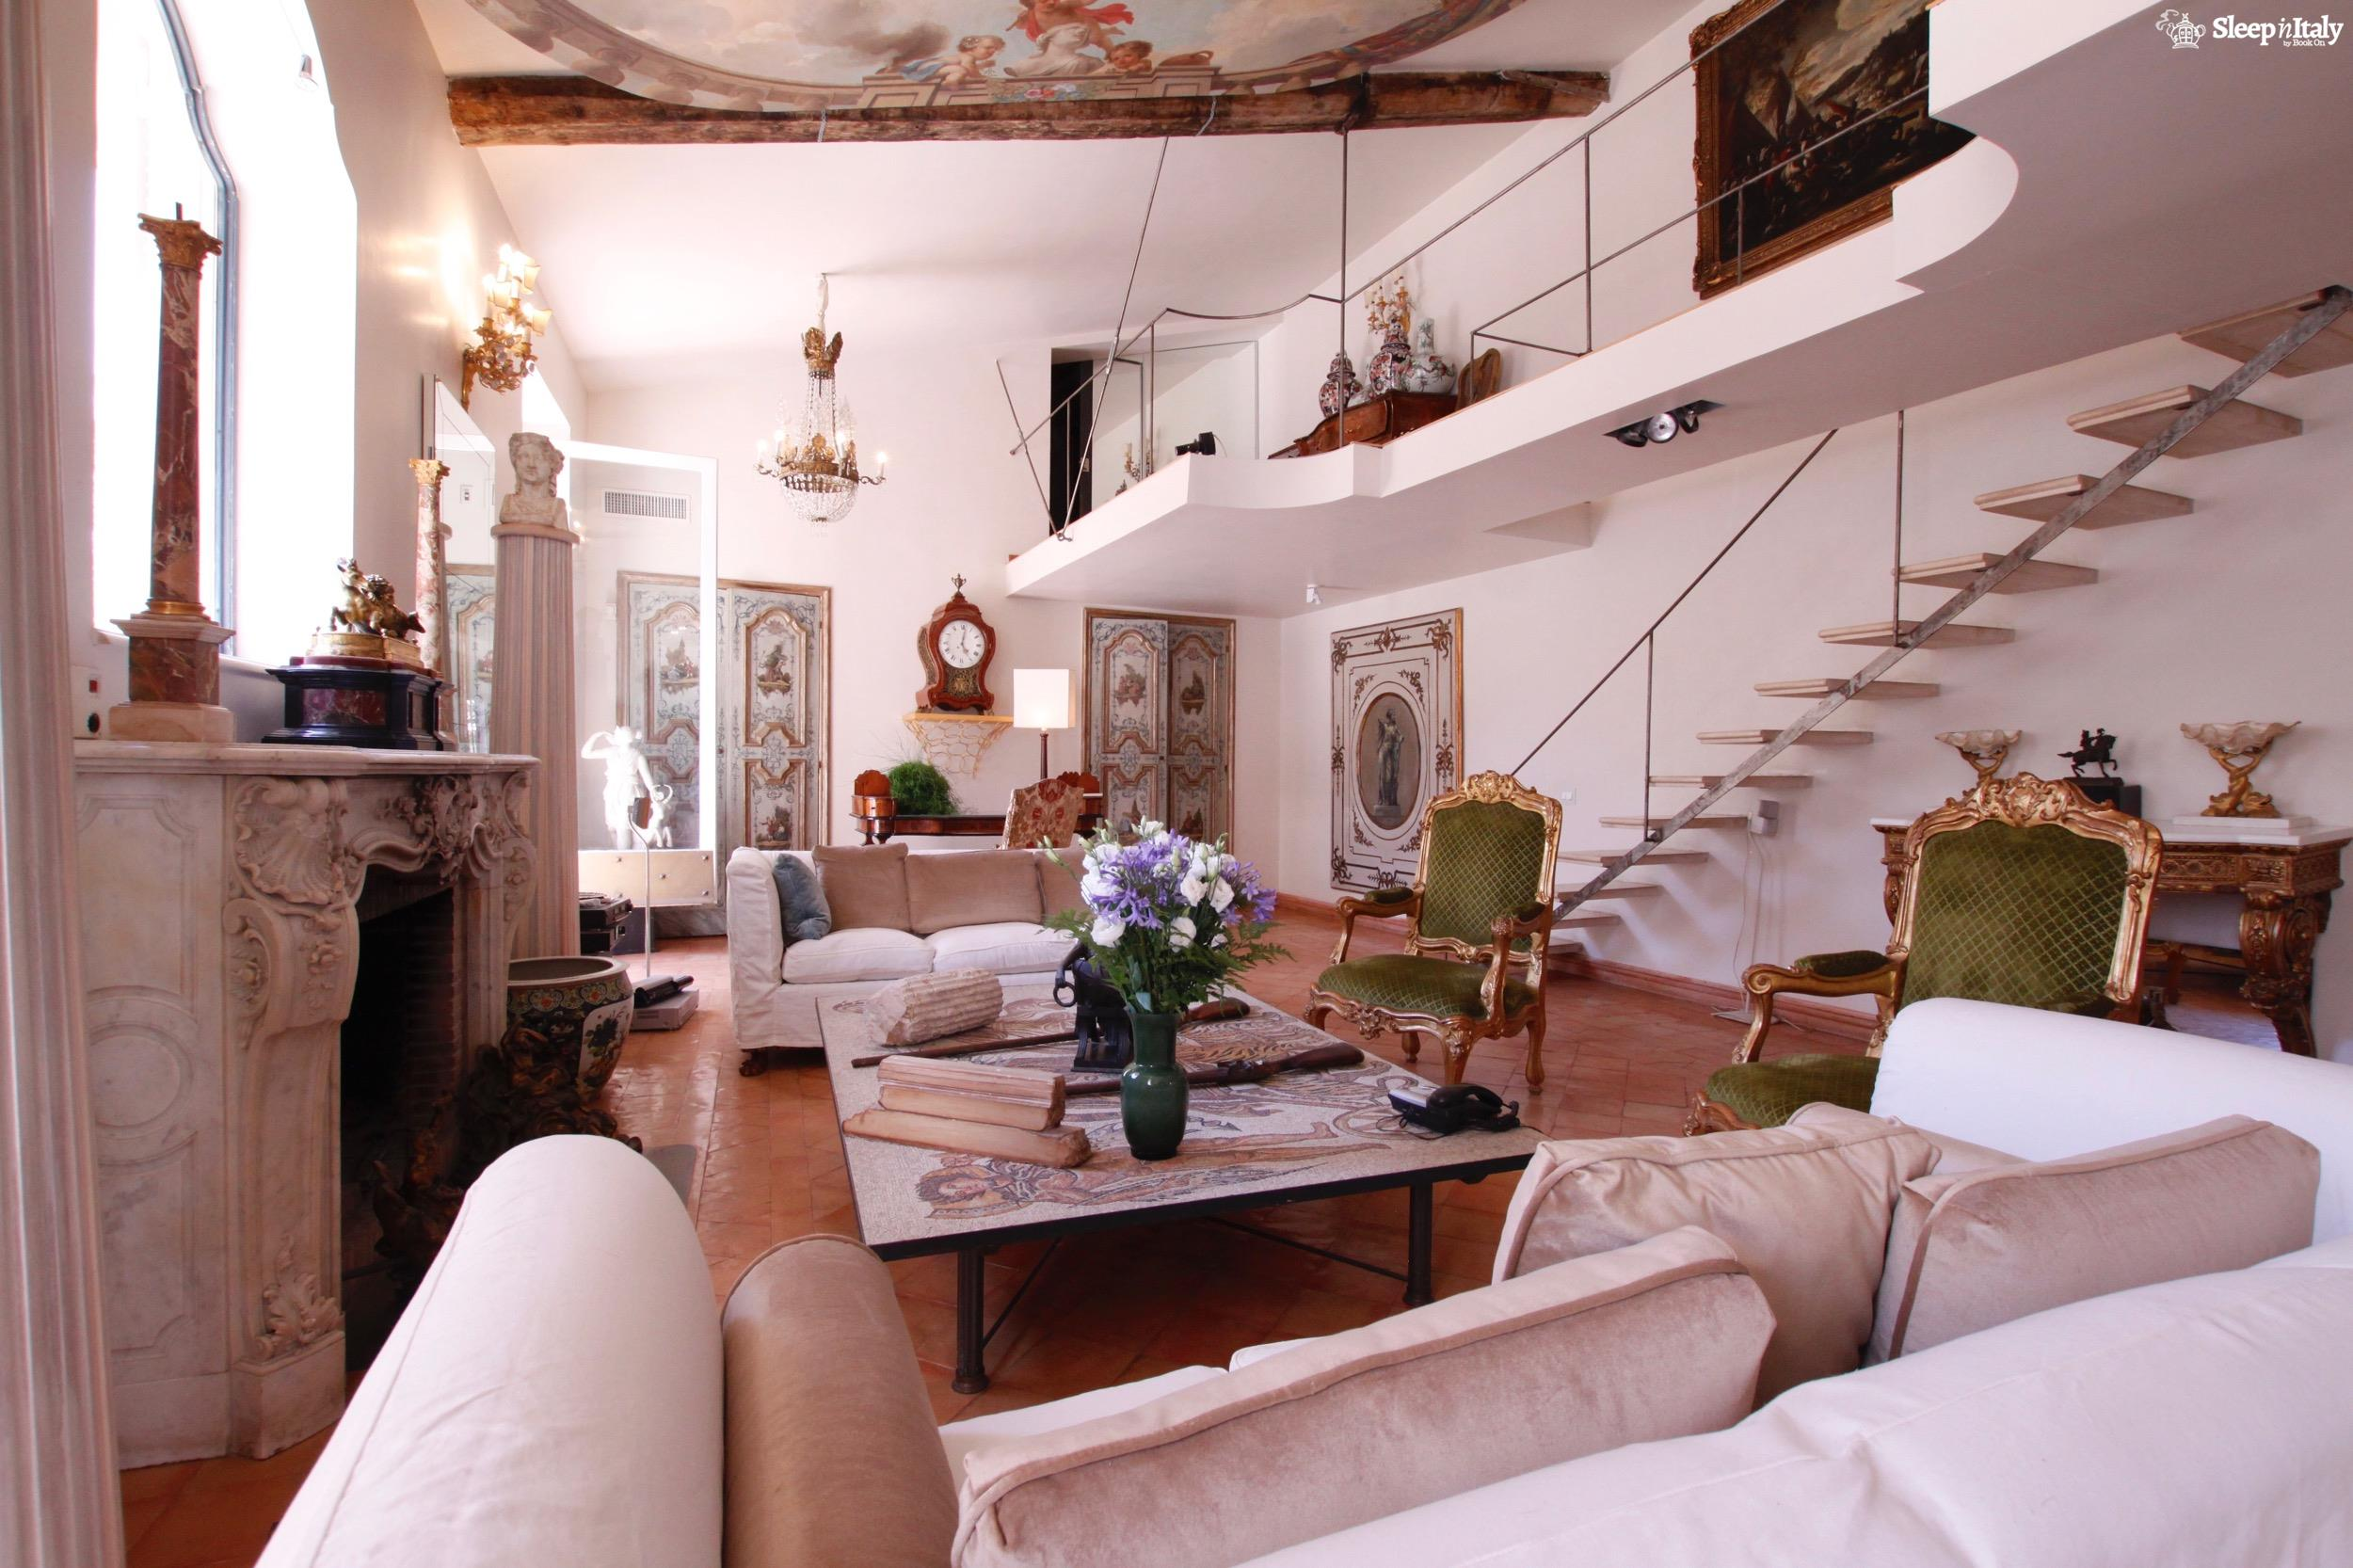 Promo 60% Off Rome Unique Navona Terrace 2 Br Apartment ...